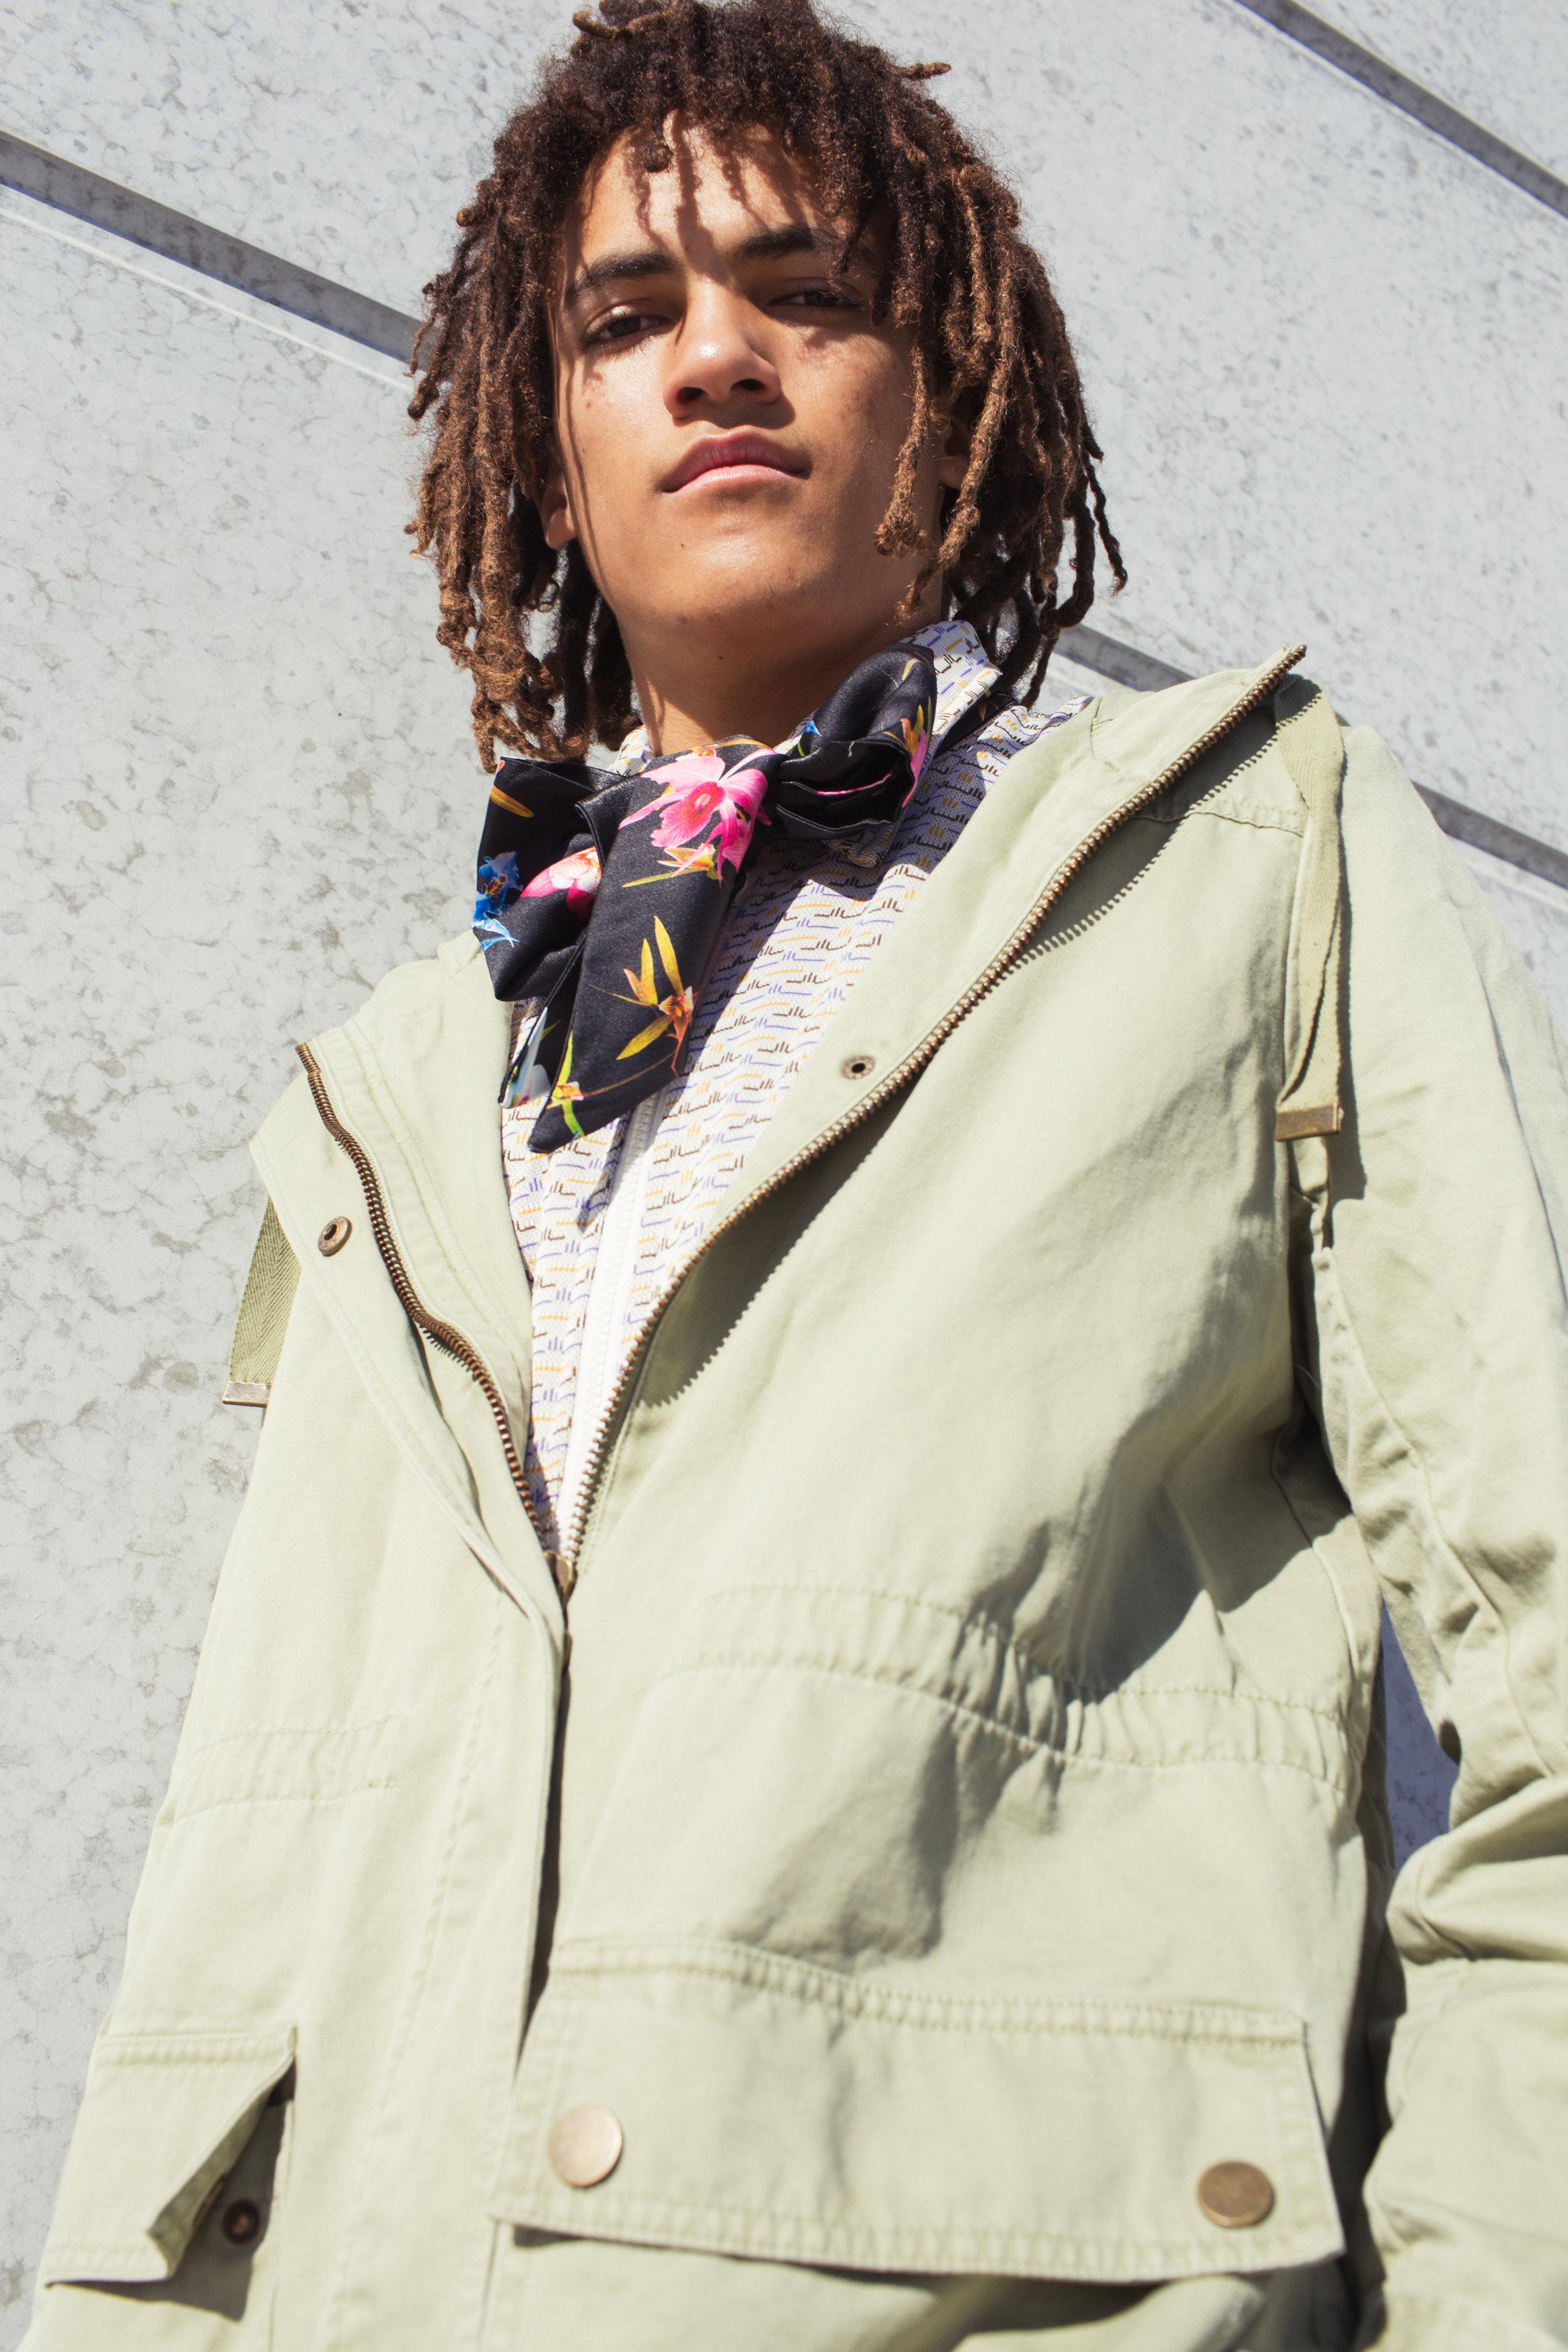 jacket   STYLIST'S OWN ,  top   A&K DEMTRE ,    scarf   MIMCO